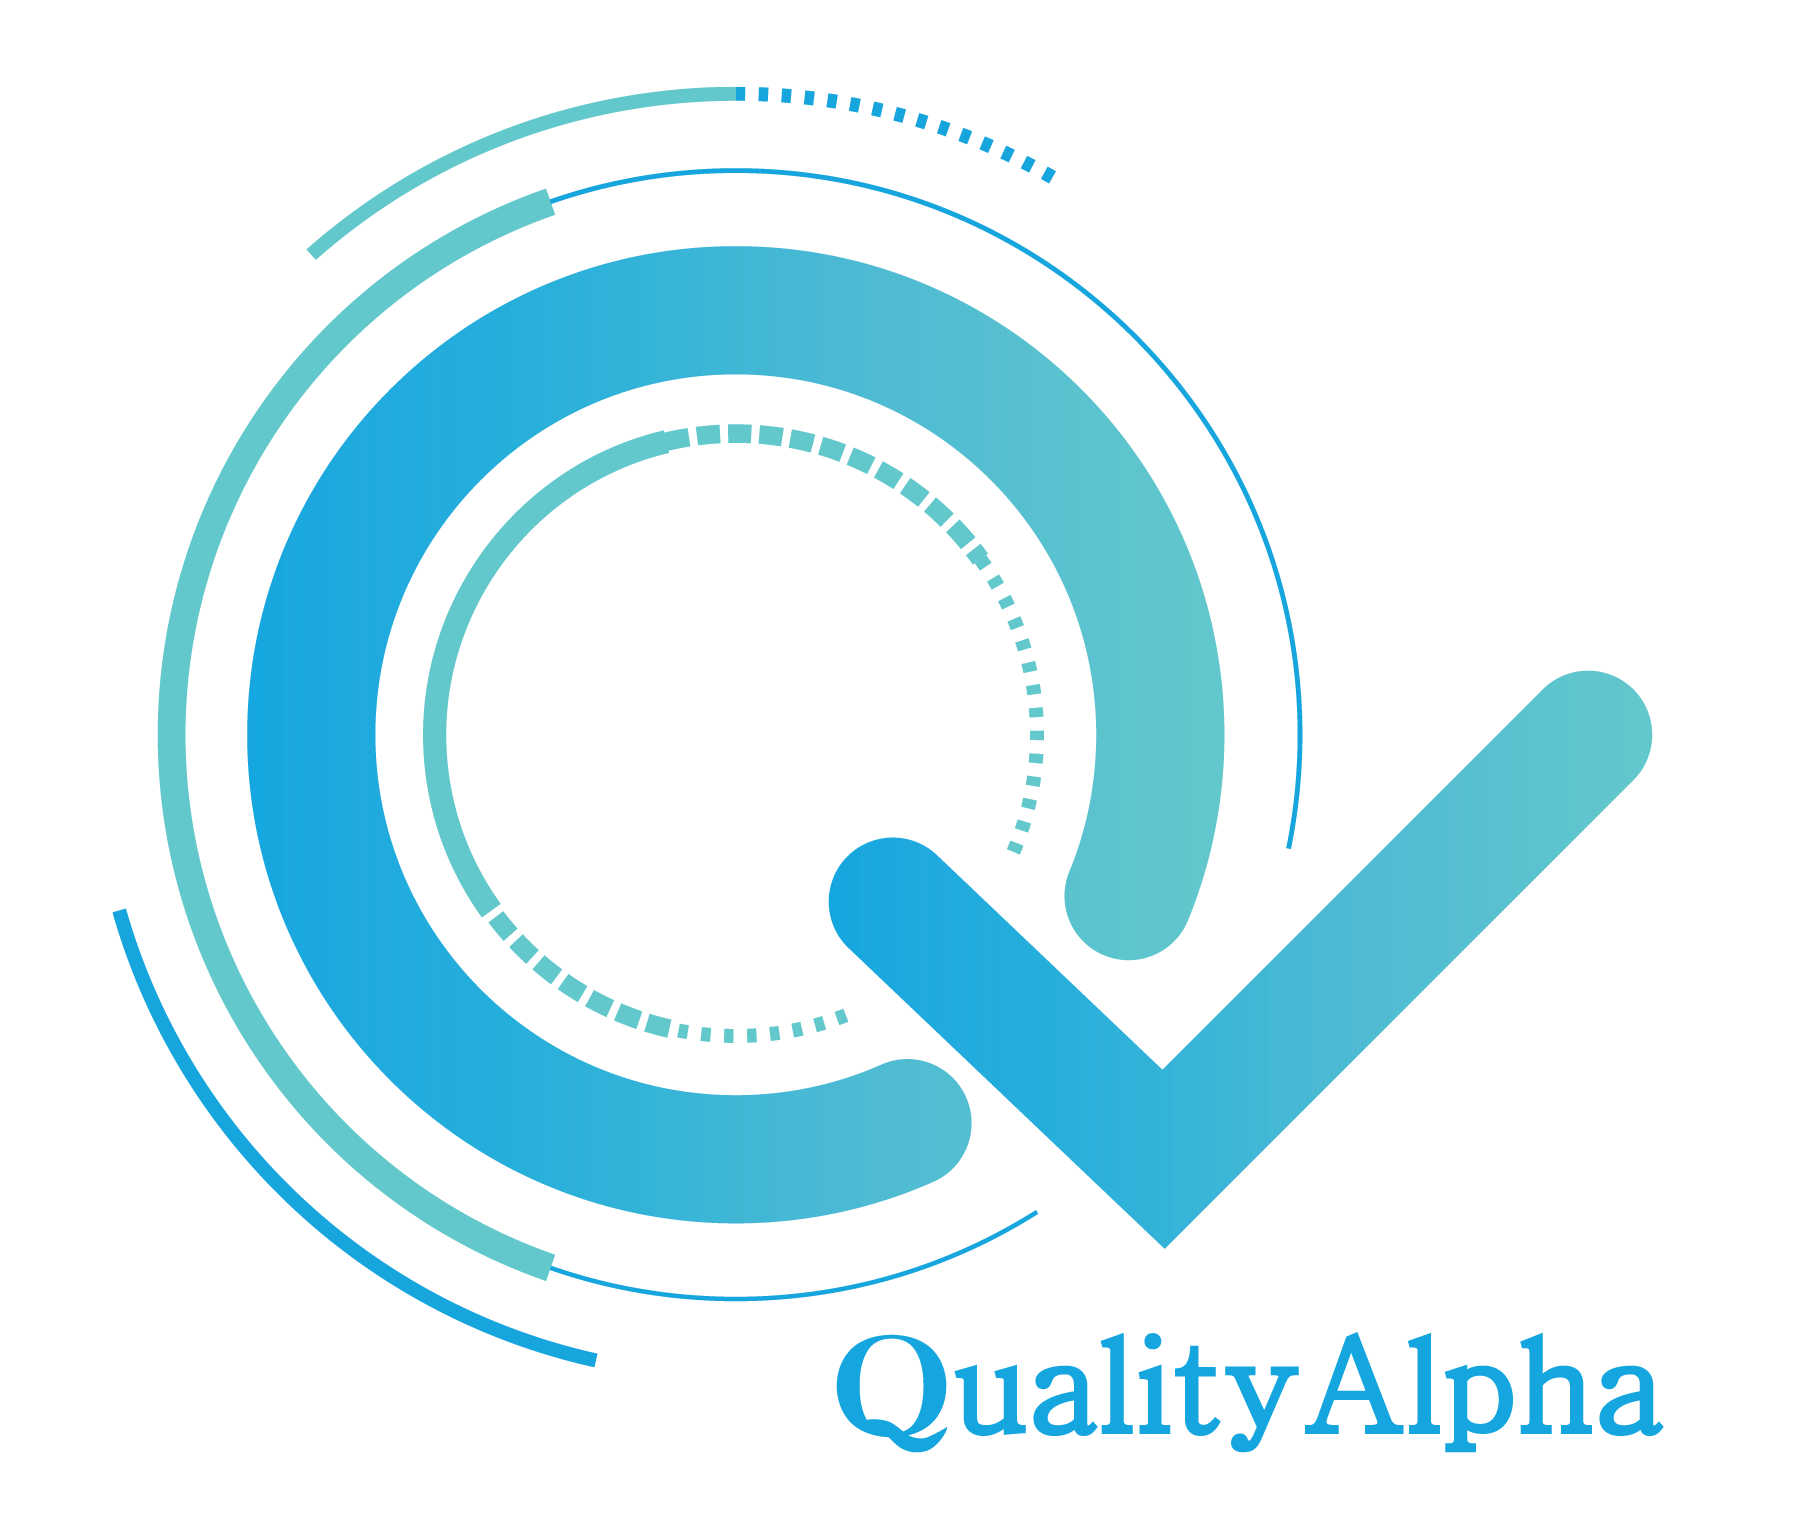 QualityAlpha